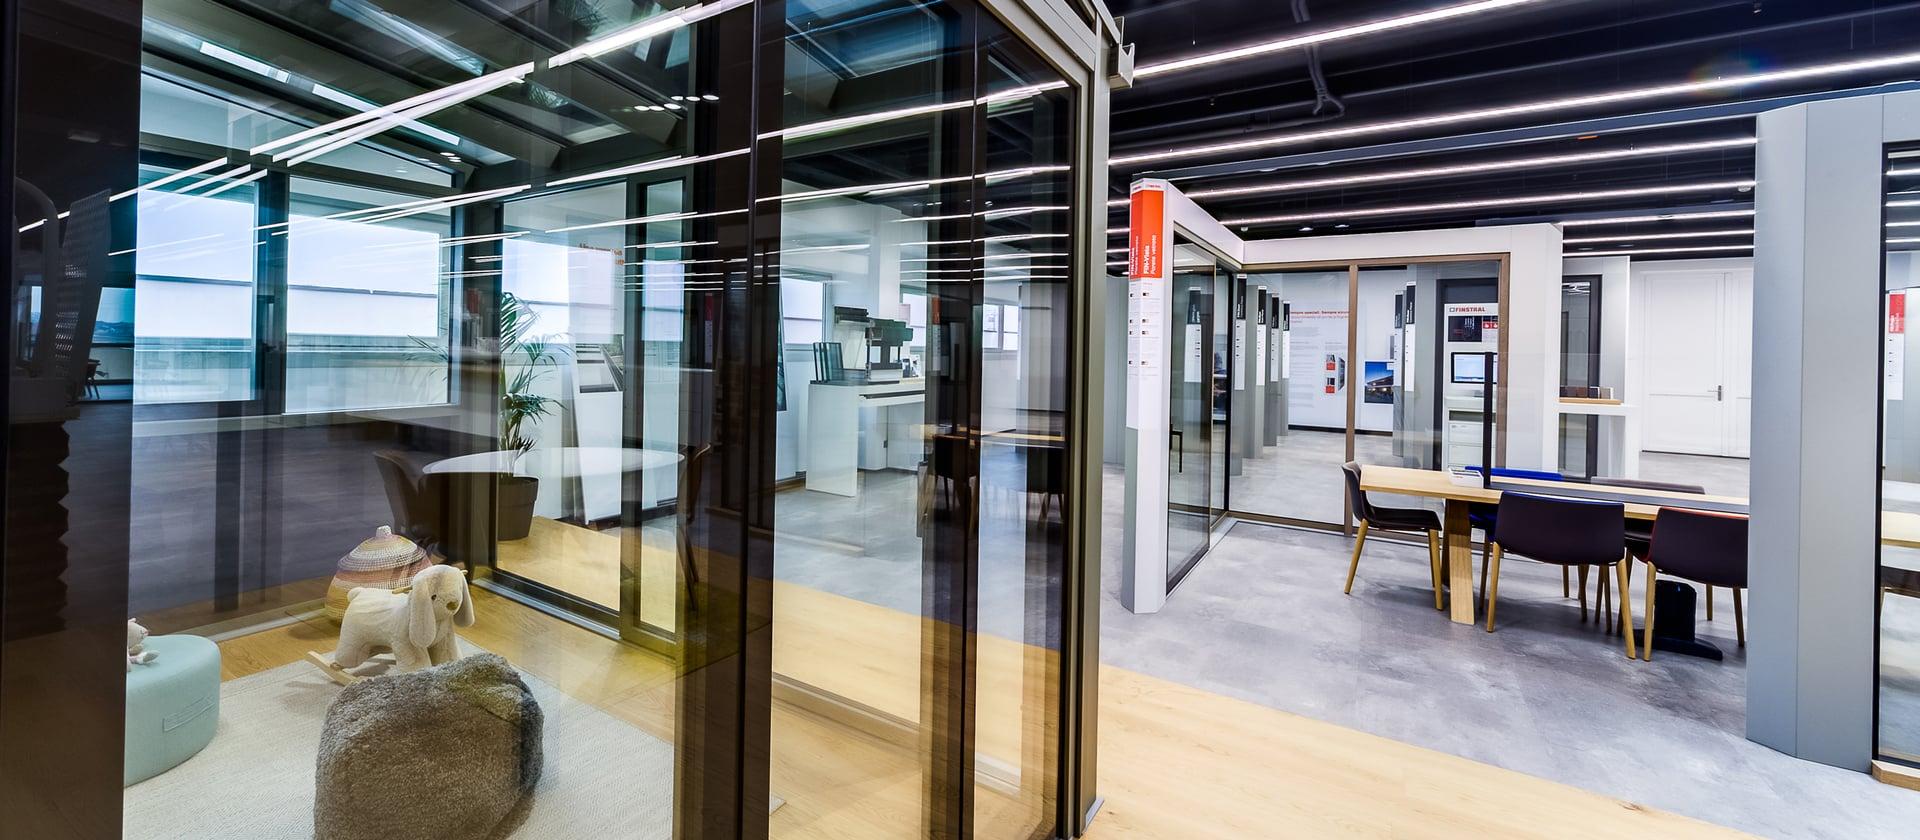 Studio Finstral Oppeano